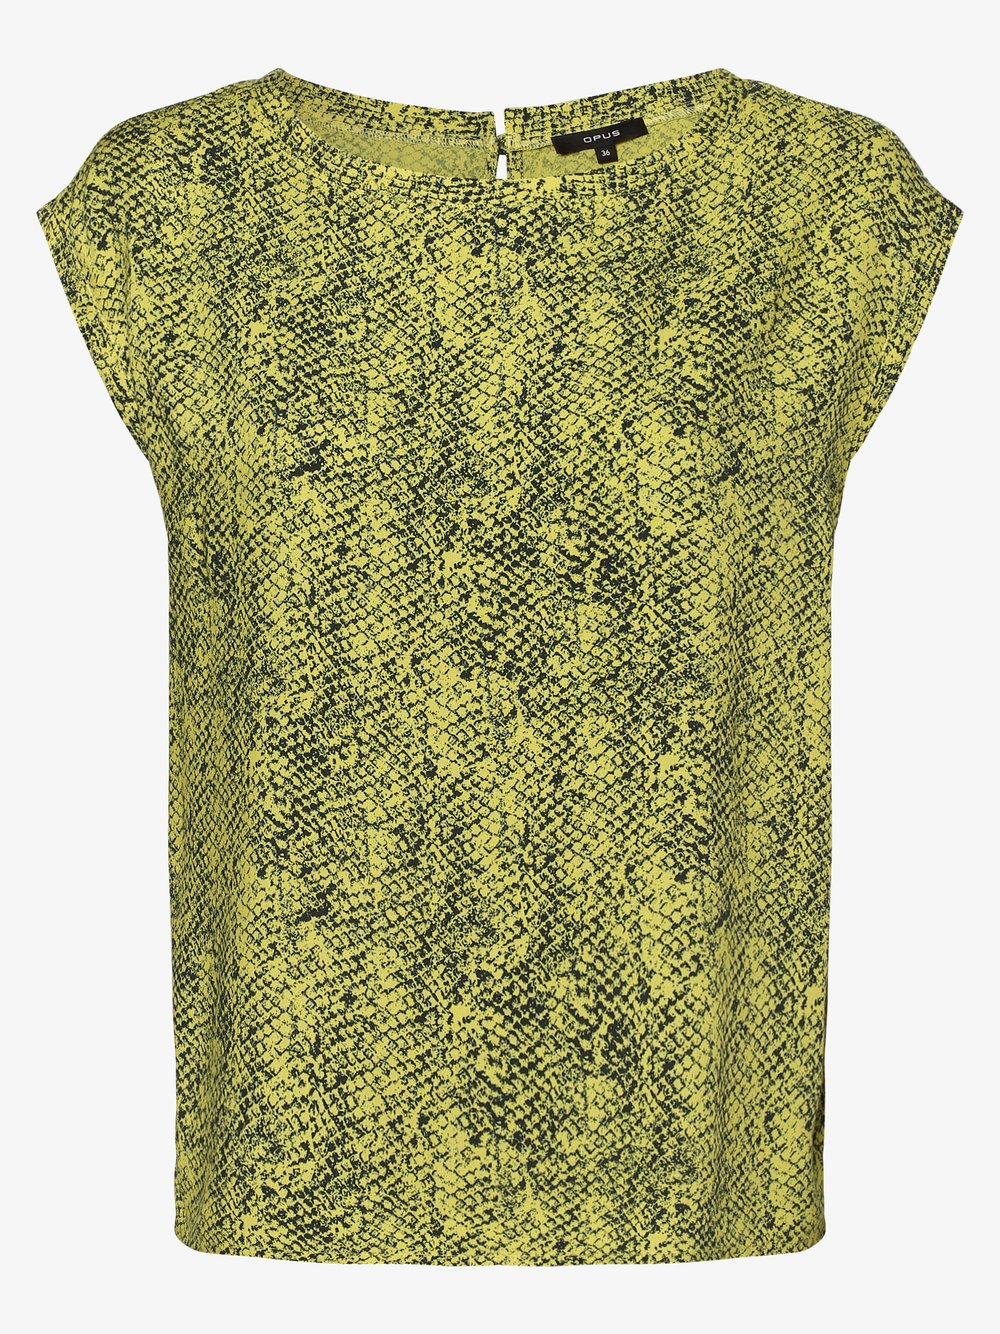 Opus – Bluzka damska – Faune, żółty Van Graaf 480581-0001-00360